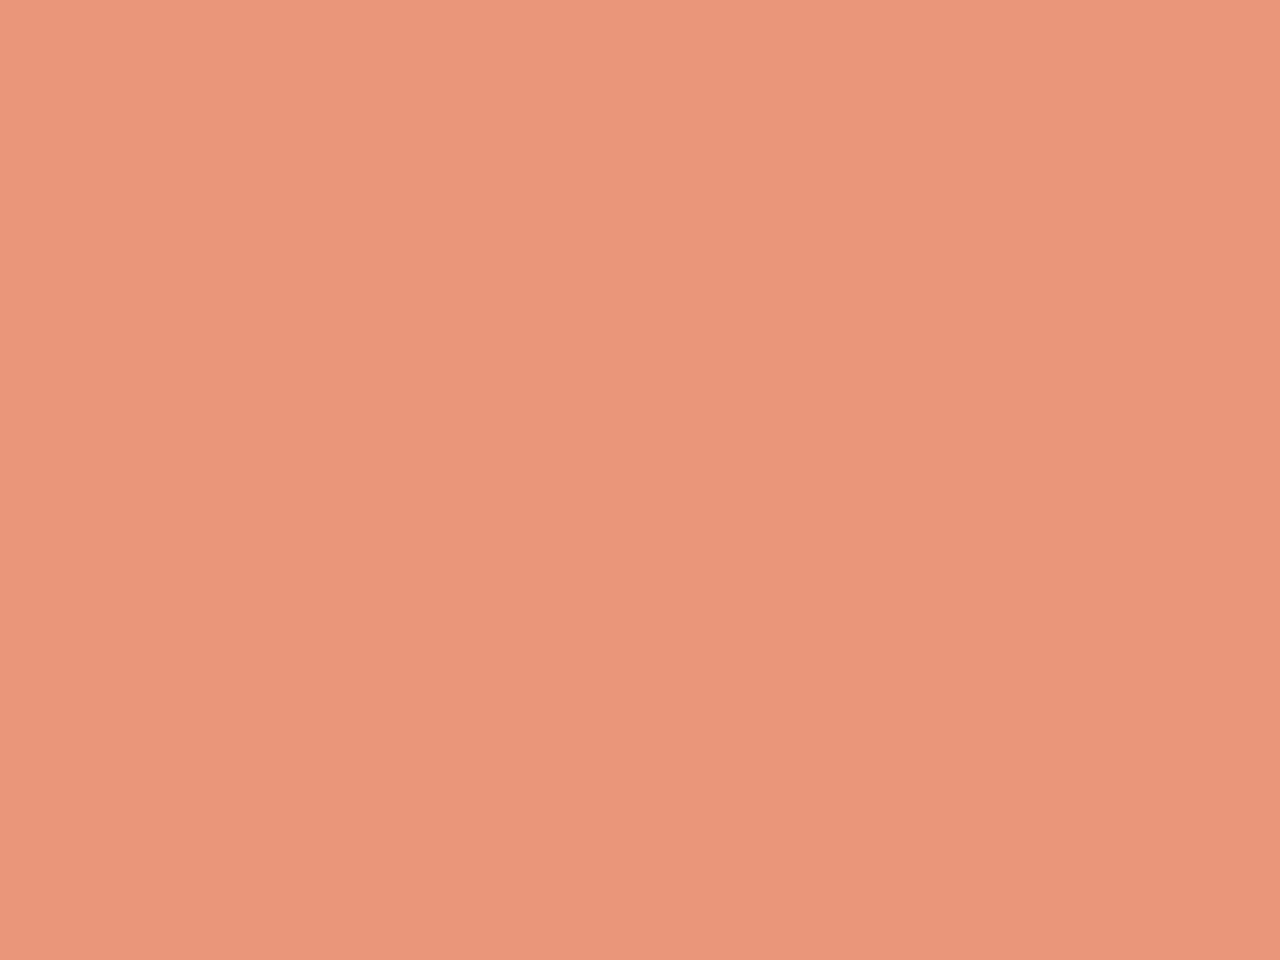 1280x960 Dark Salmon Solid Color Background